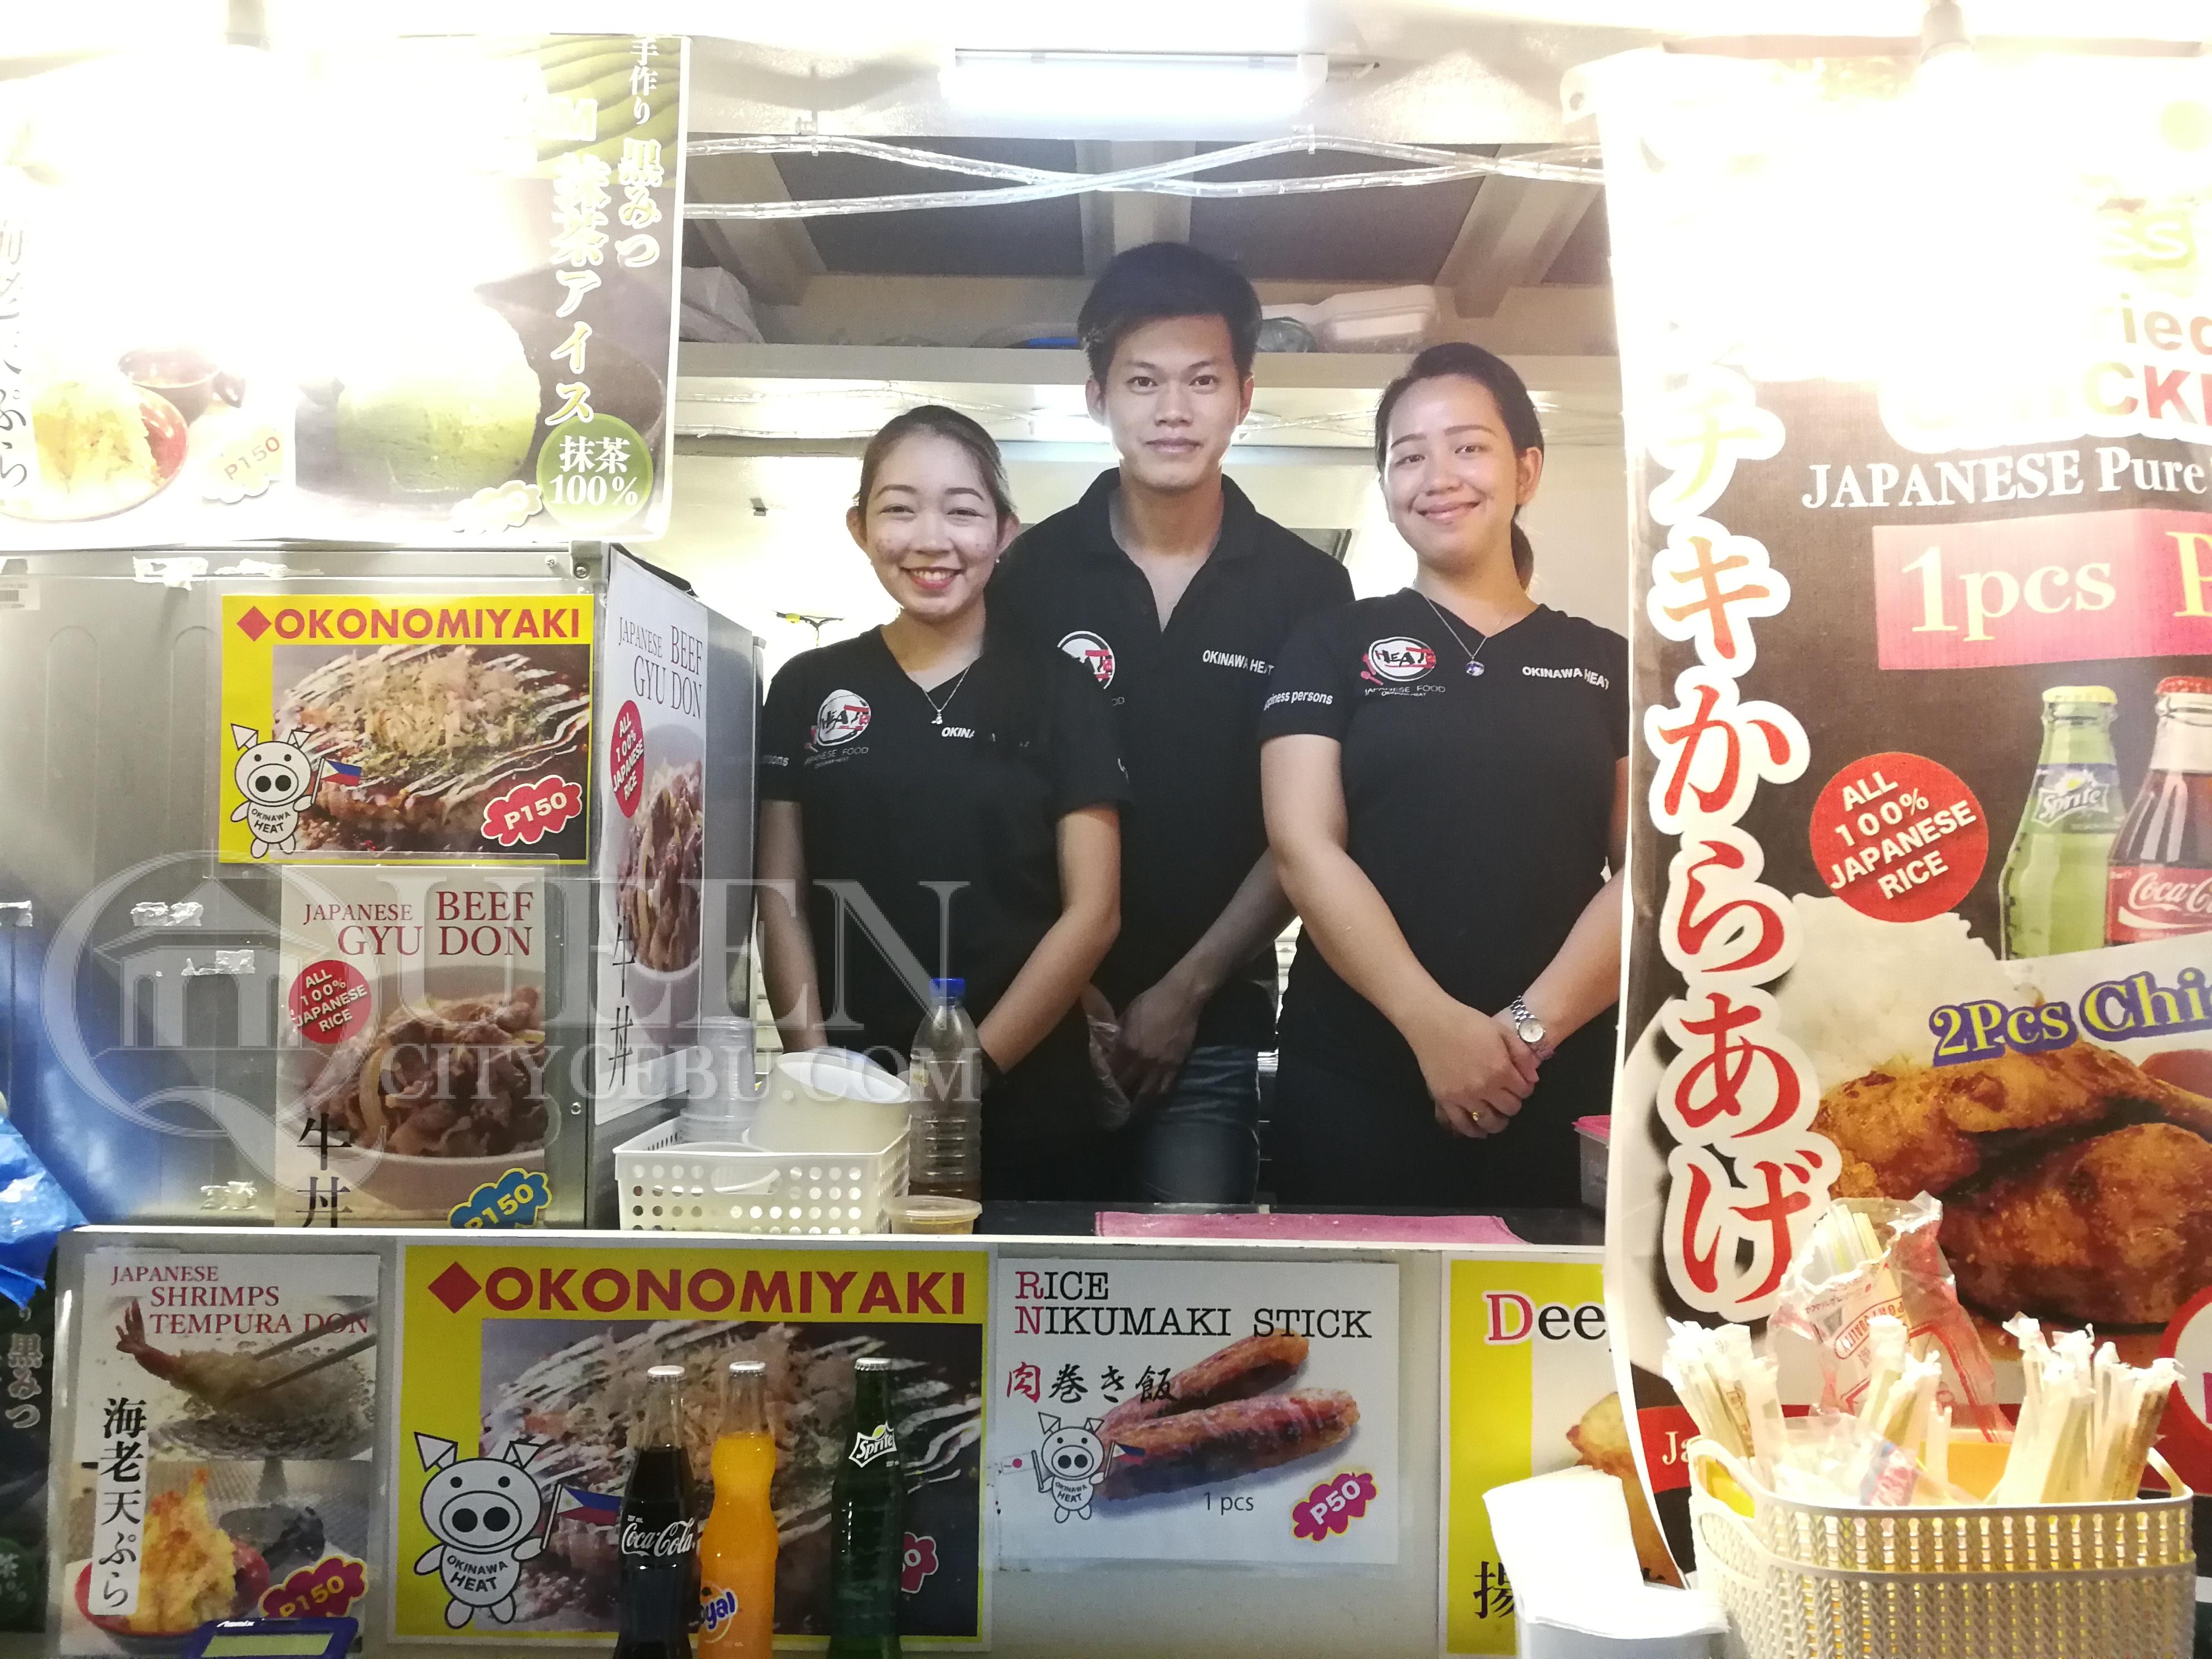 Okinawa Heat Japanese Food Truck Staff